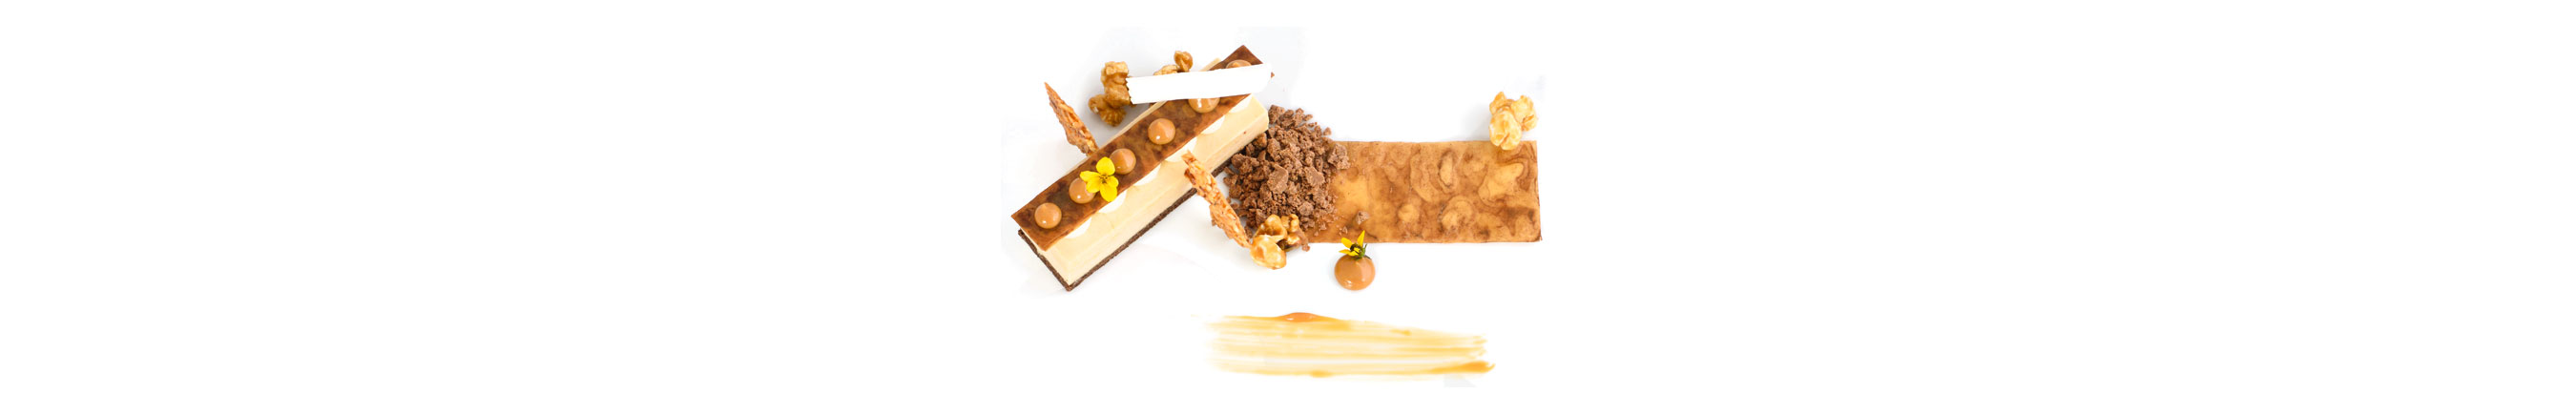 slideshow-dessert-chocolate